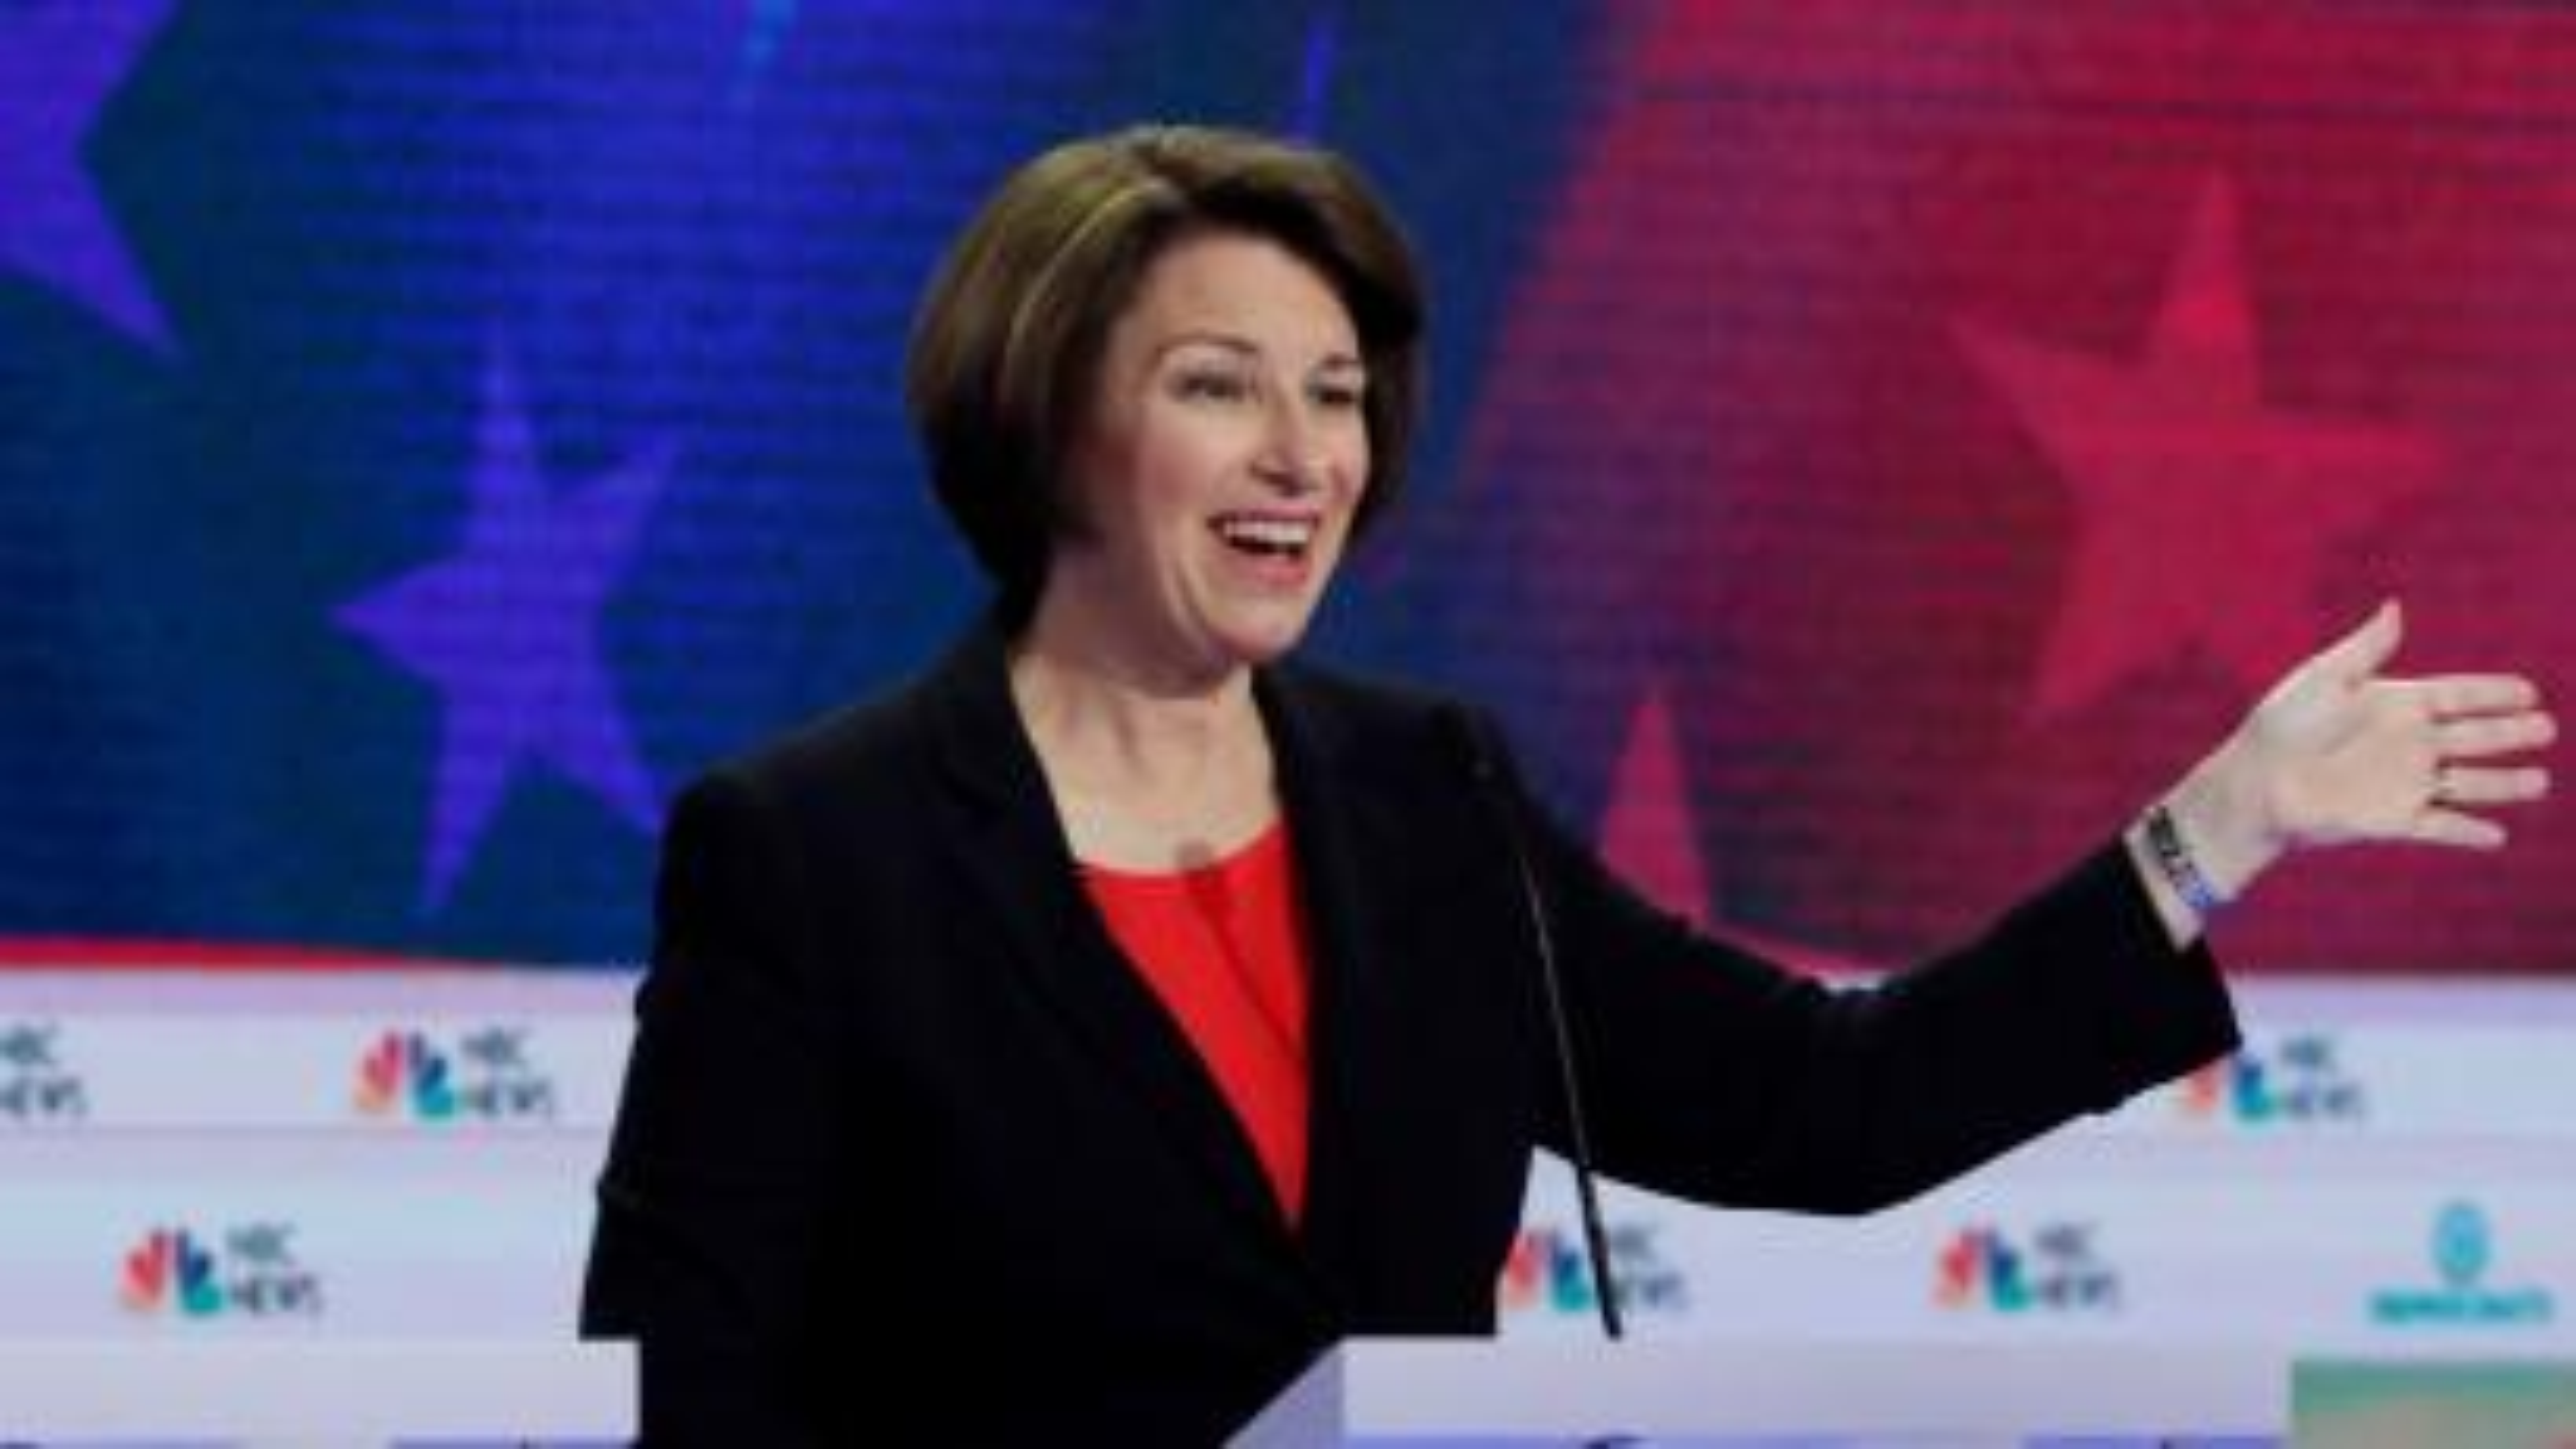 Senator Amy Klobuchar will bring us folksy aphorisms.